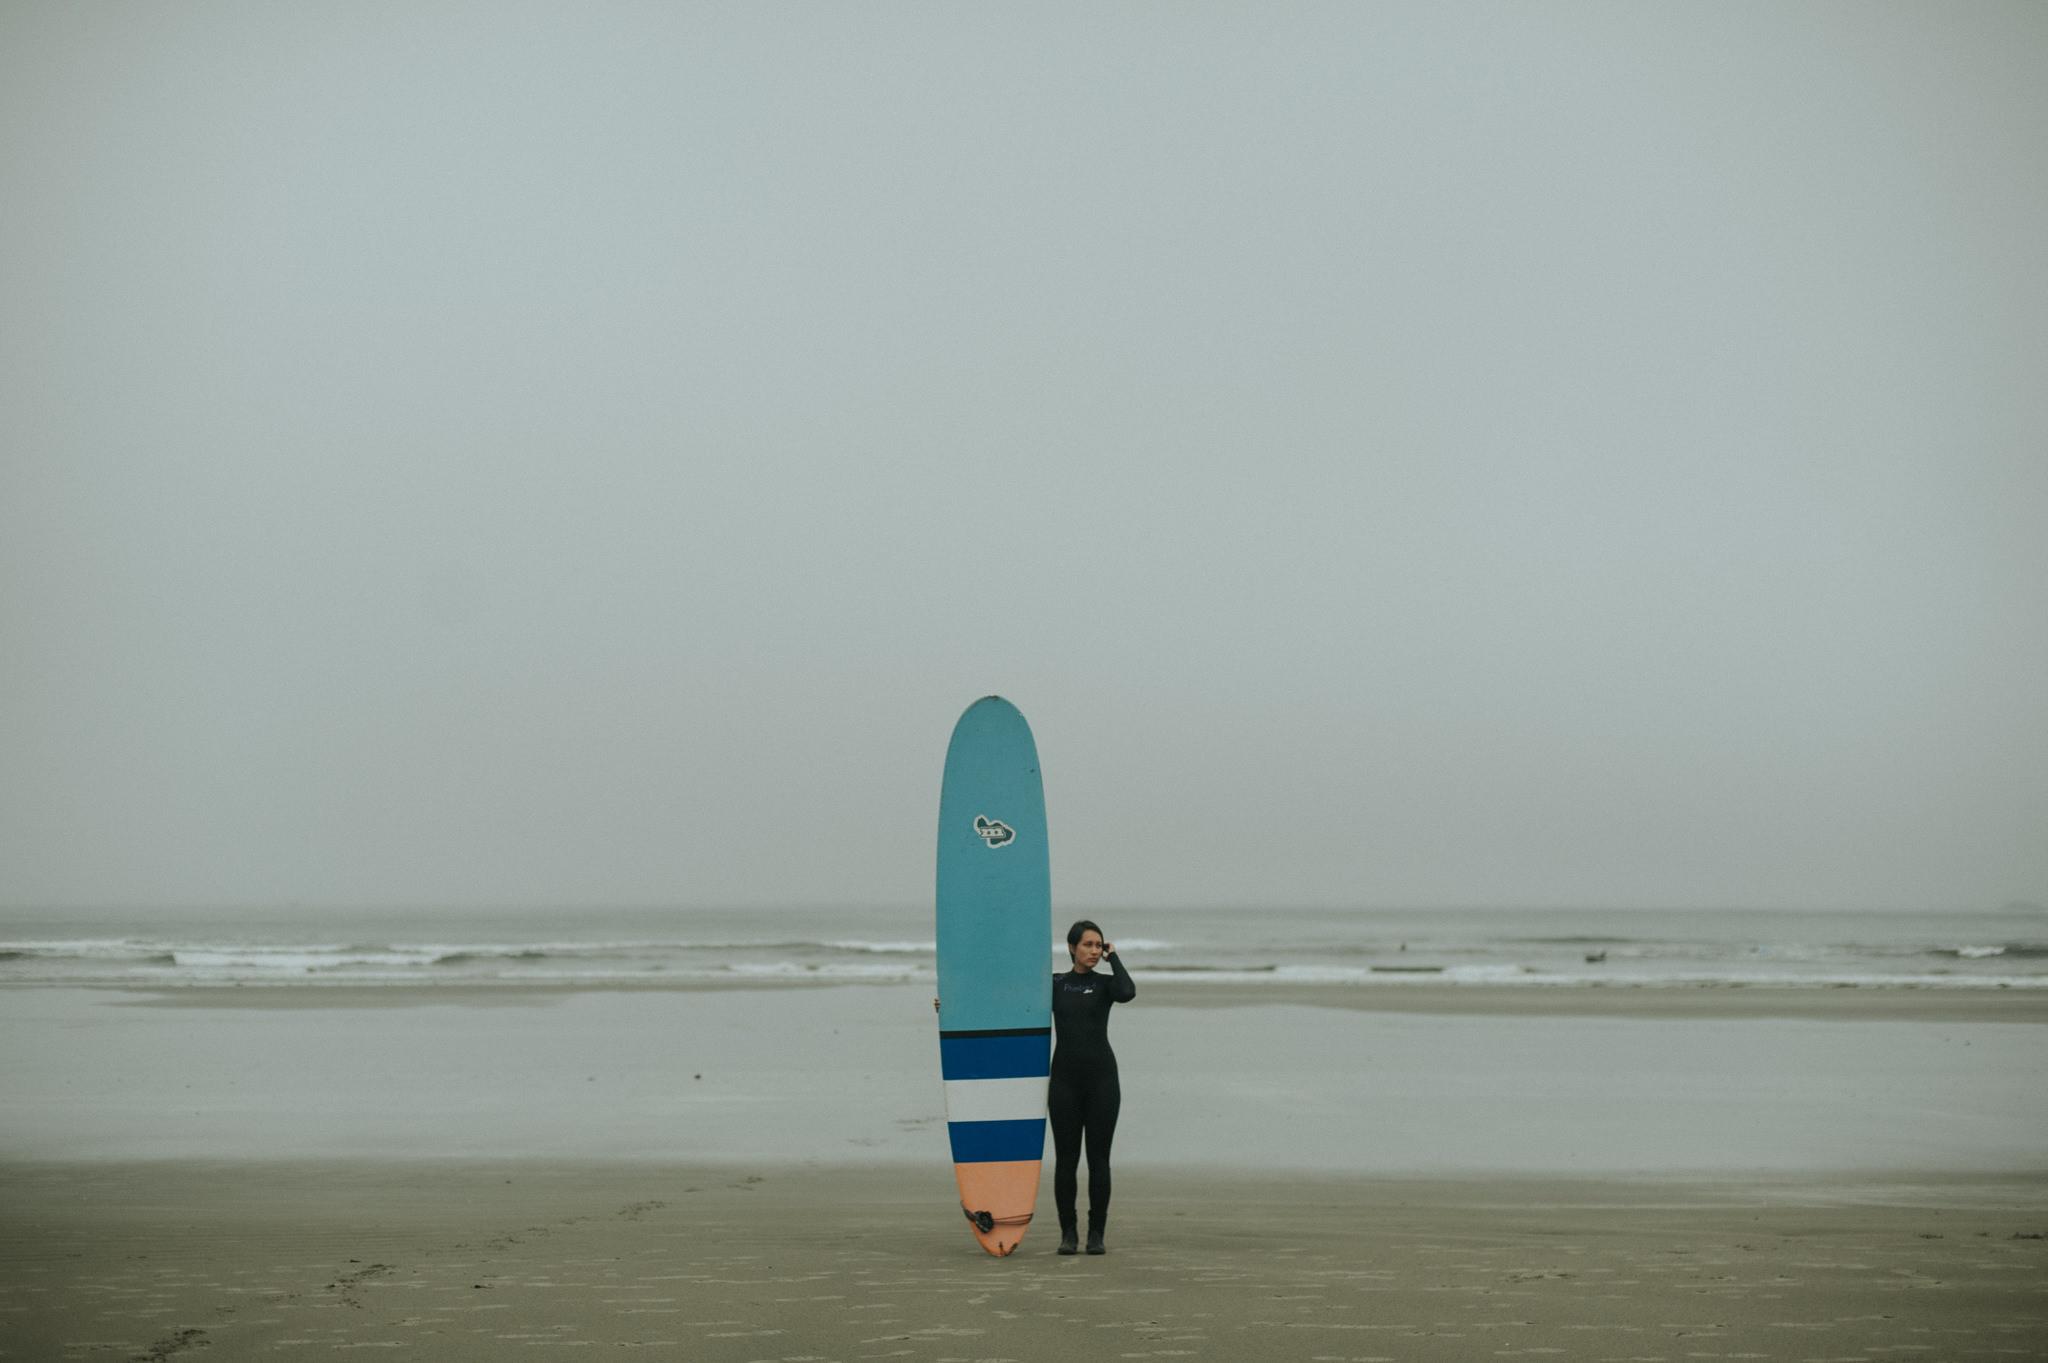 Surfing in Tofino at Cox Bay // Daring Wanderer: www.daringwanderer.com